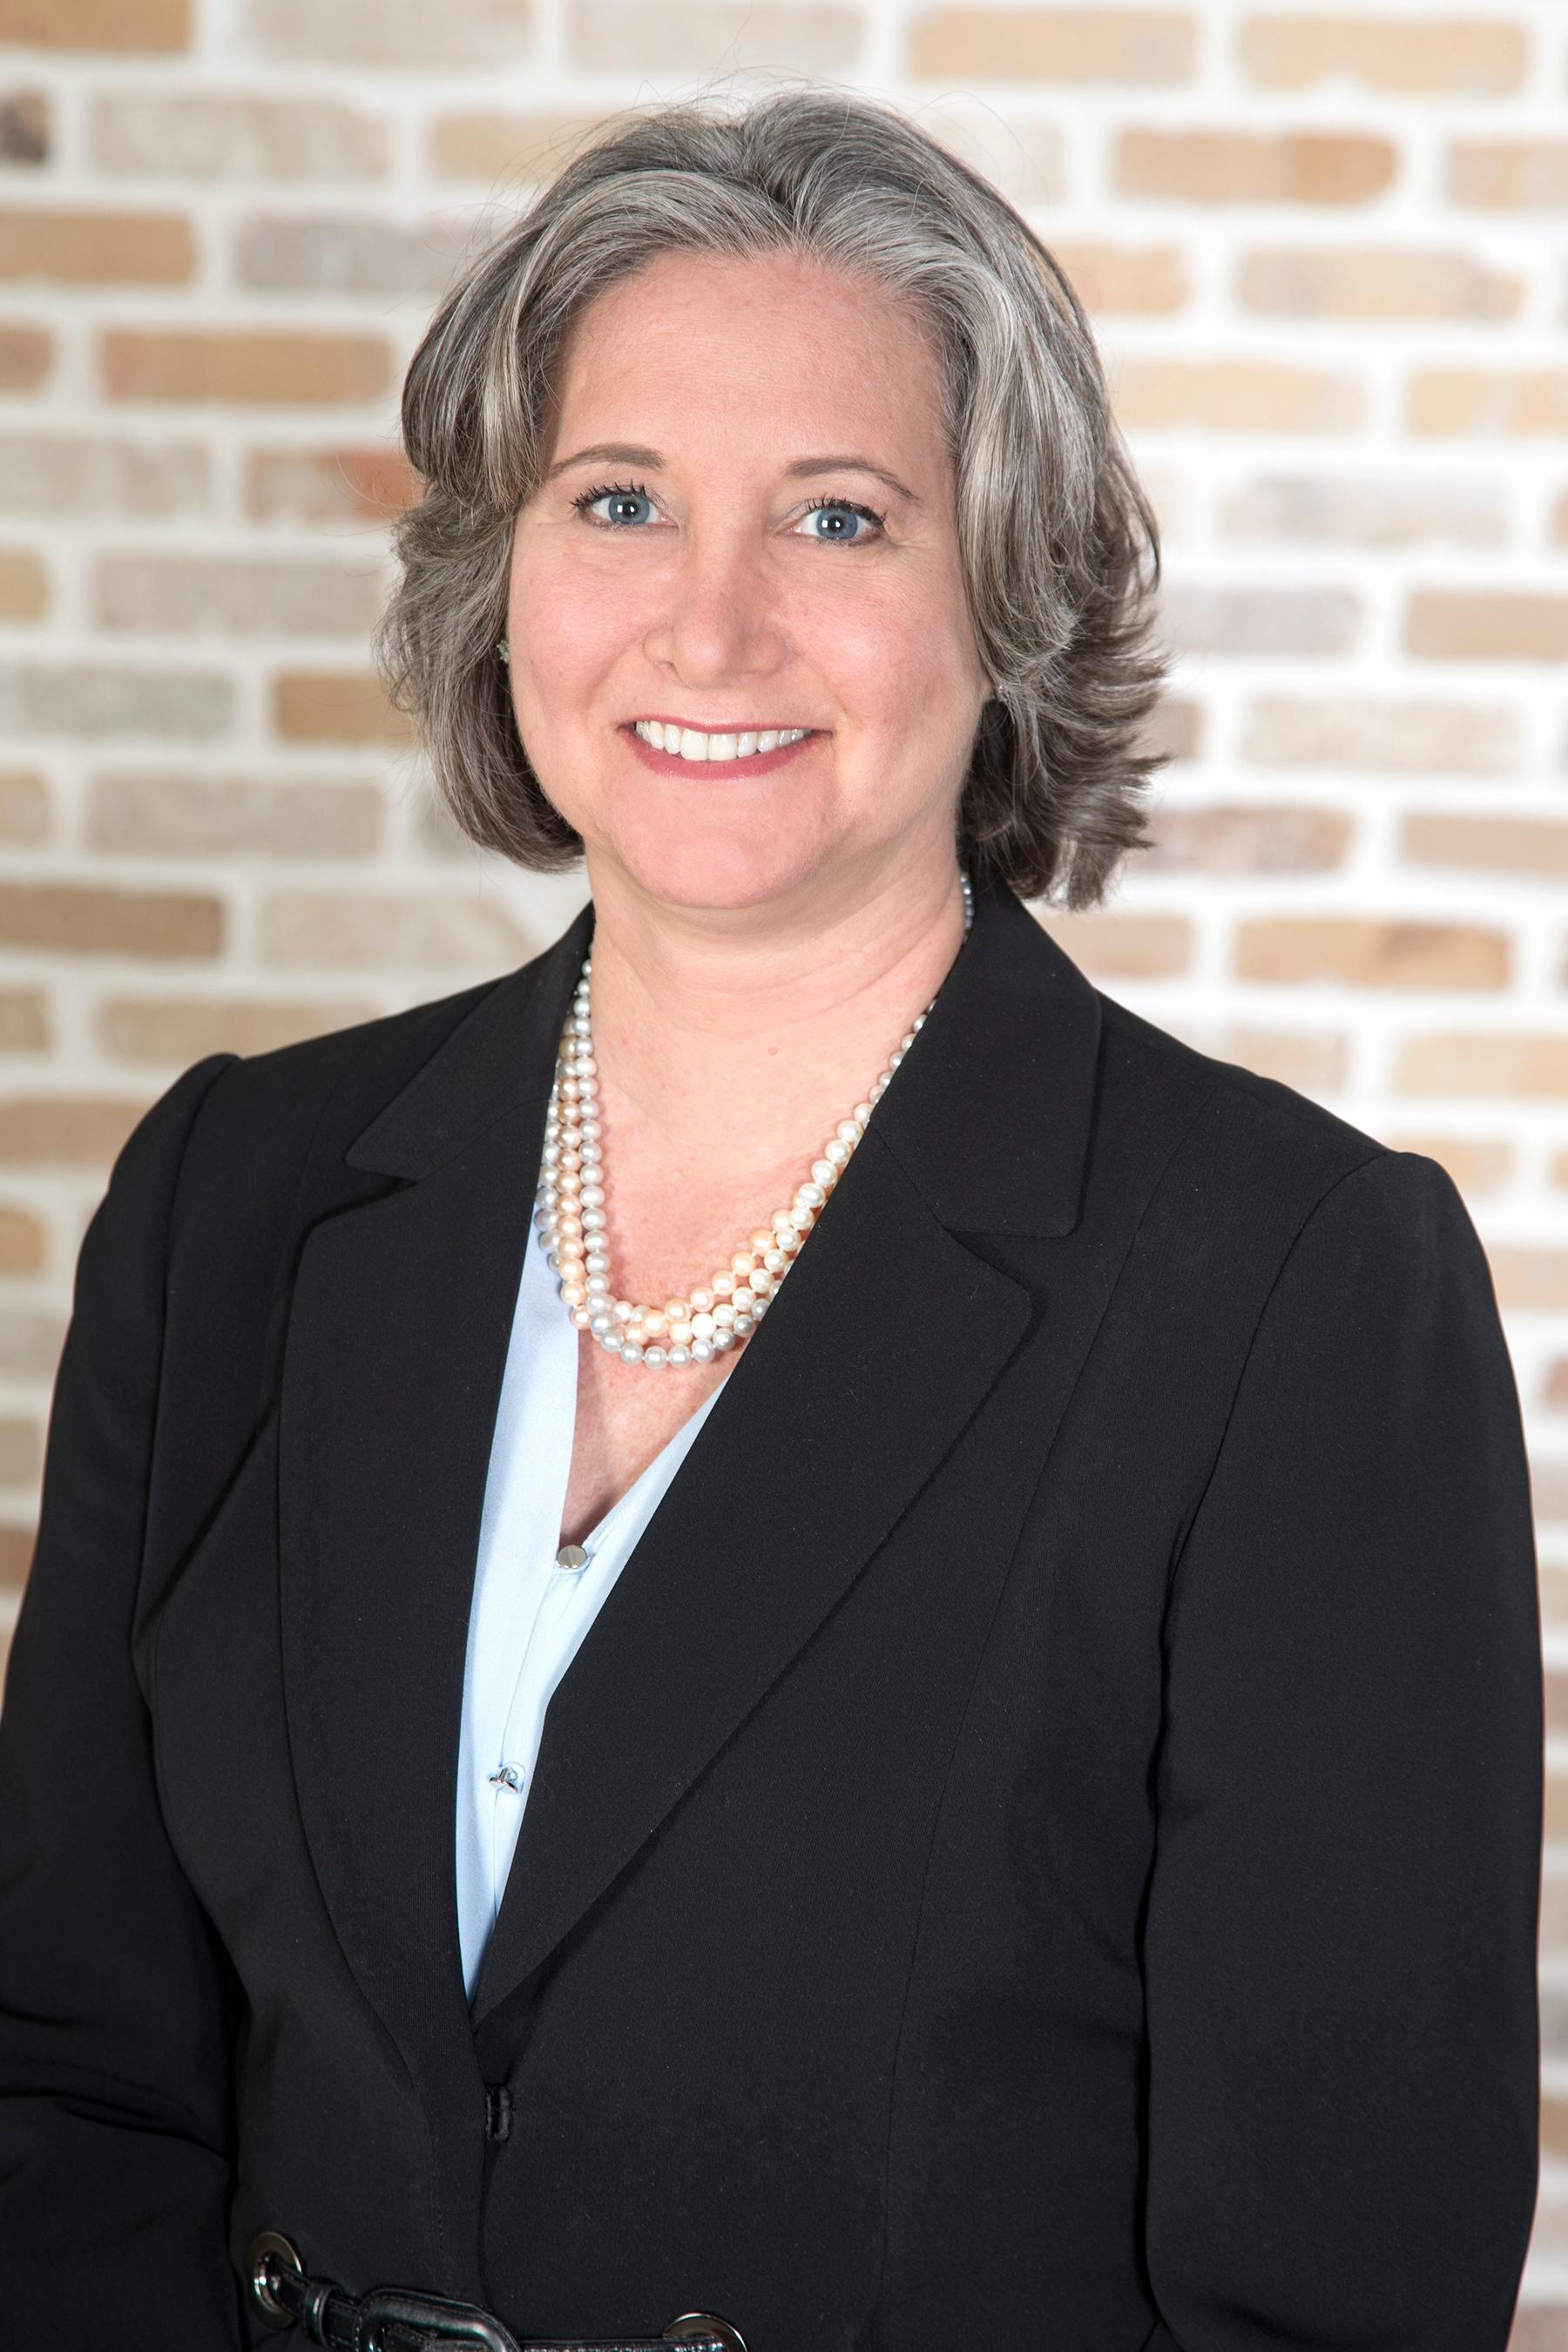 Emmy Weber, Chief Marketing Officer